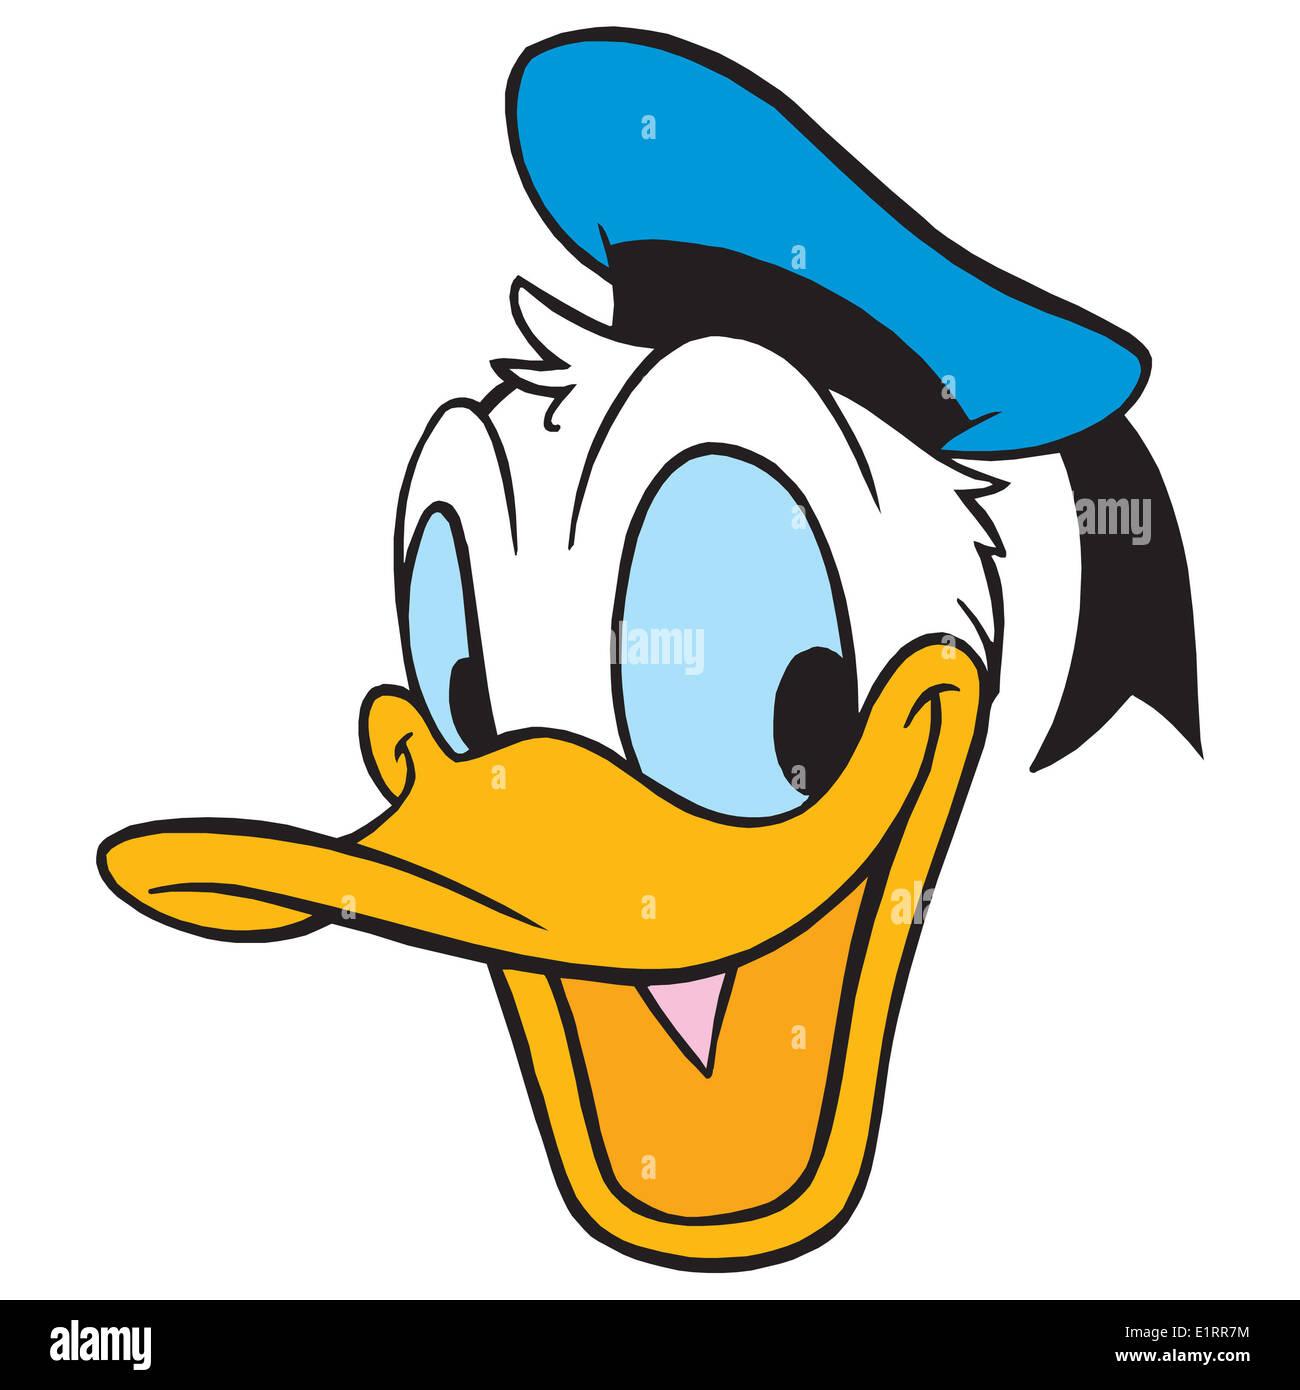 donald duck stock photo 69979272 alamy